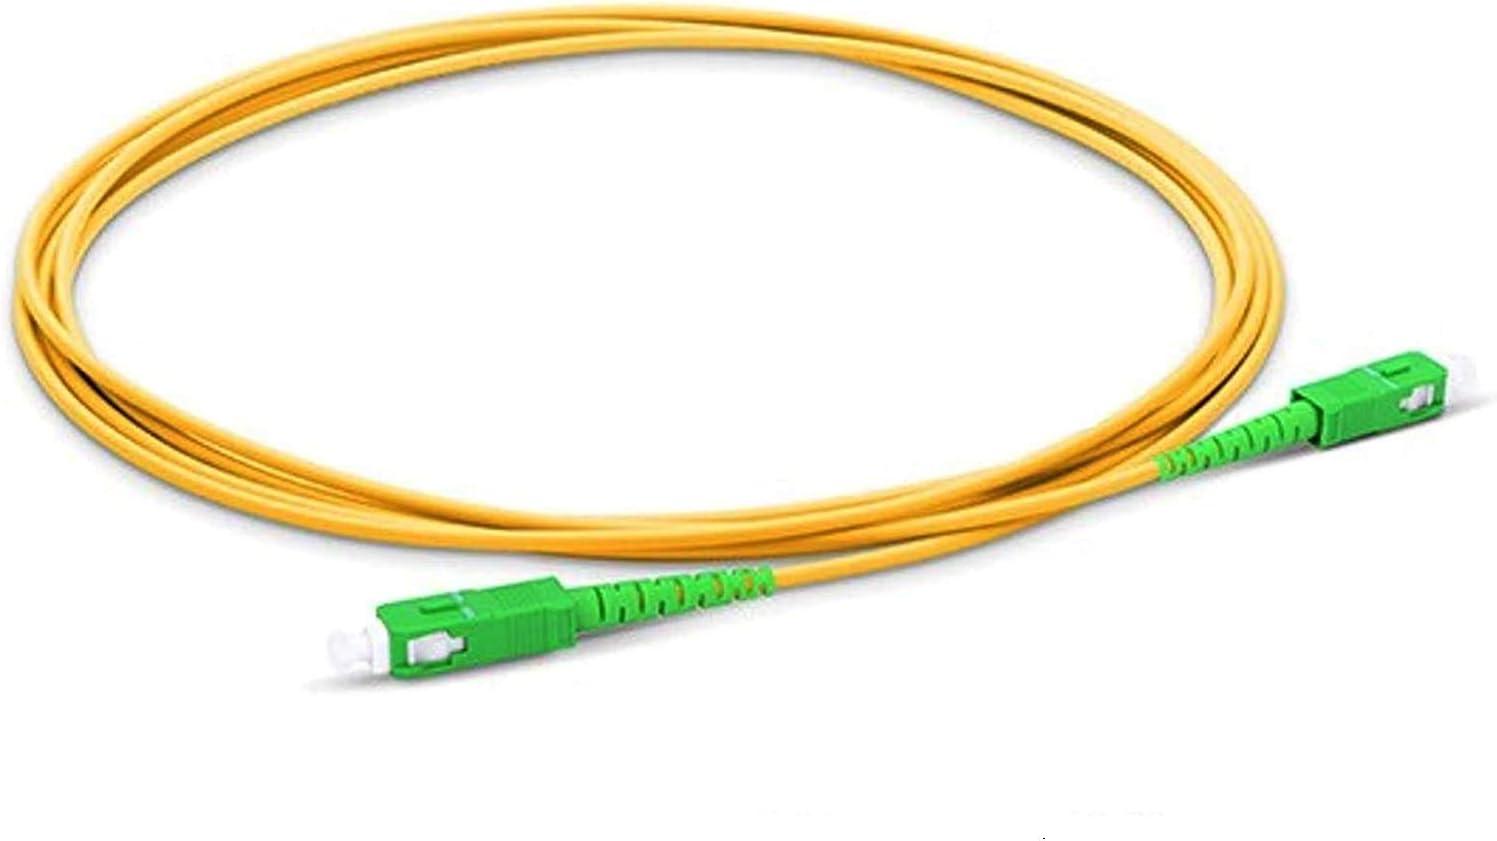 Cable de Fibra Óptica para Router - Latiguillo Monomodo FTTH - 9/125 OS2 - SC/APC-SC/APC Simplex - Compatible 99% Operadores Movistar Jazztel Vodafone Orange Amena Masmovil Yoigo (1 M)